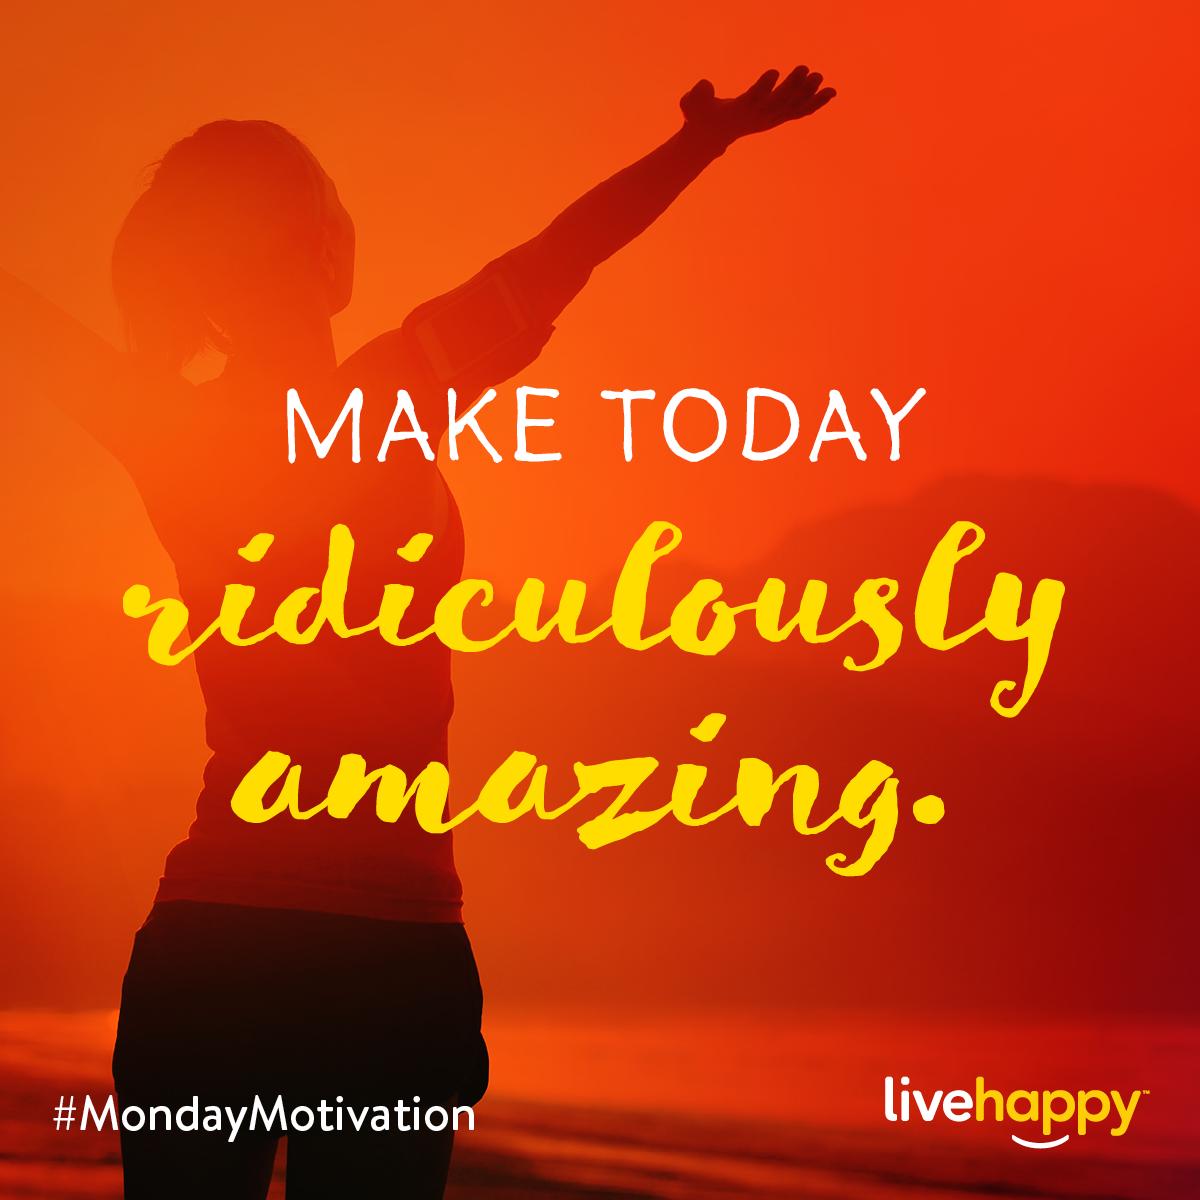 8 Aug Social Monday Motivation.png